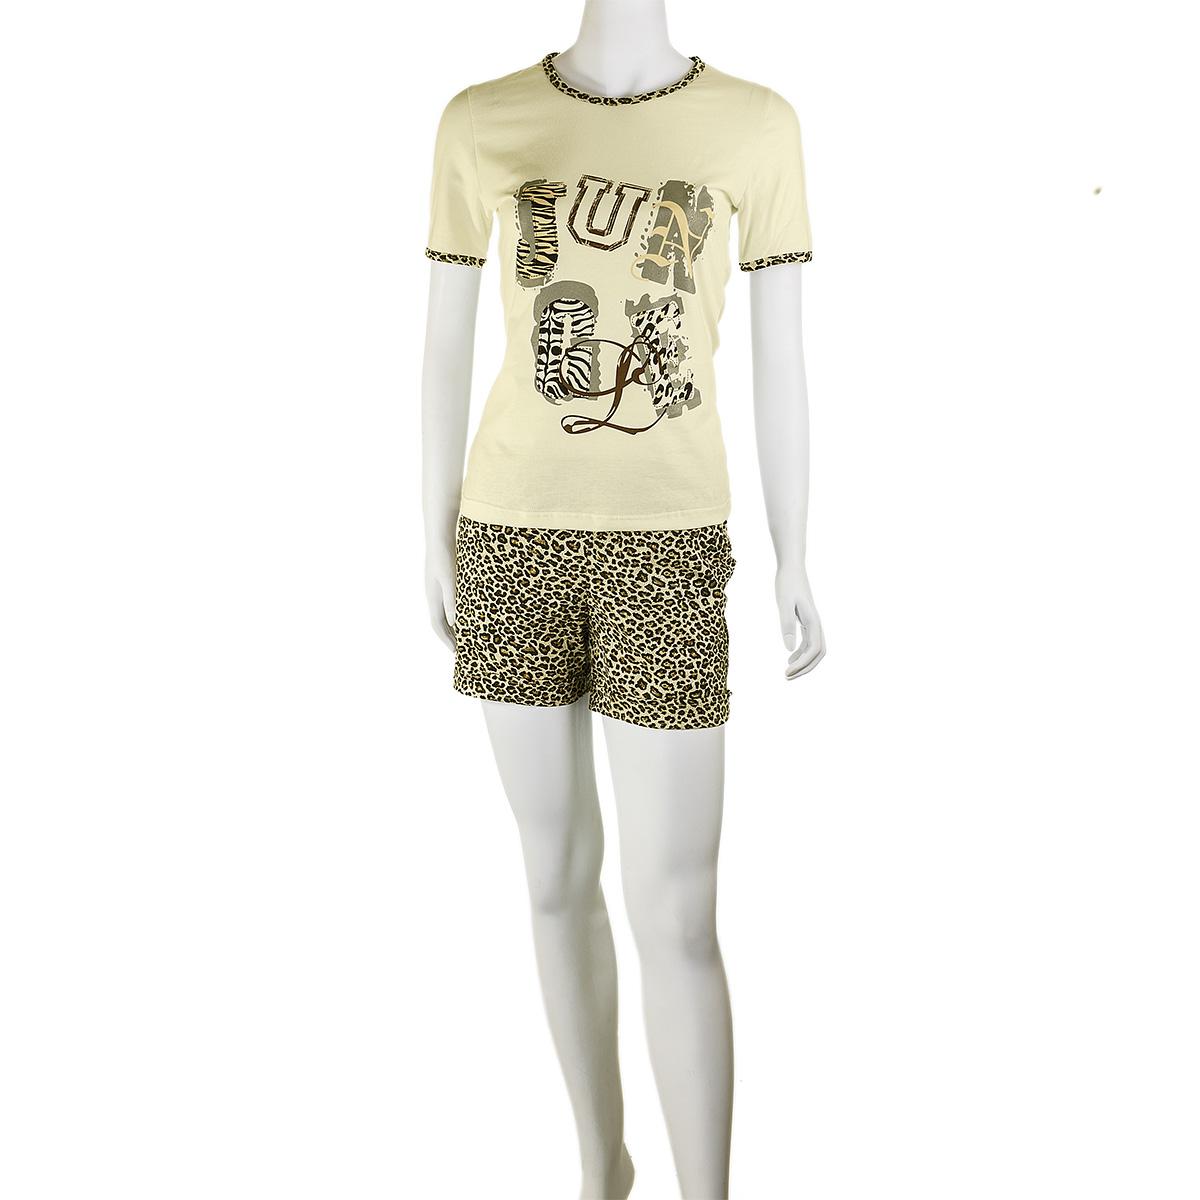 Женский костюм Джунгли арт. 0061, размер 42Костюмы<br>Обхват груди: 84 см <br>Обхват талии: 65 см <br>Обхват бедер: 92 см <br>Рост: 164-170 см<br><br>Тип: Жен. костюм<br>Размер: 42<br>Материал: Кулирка